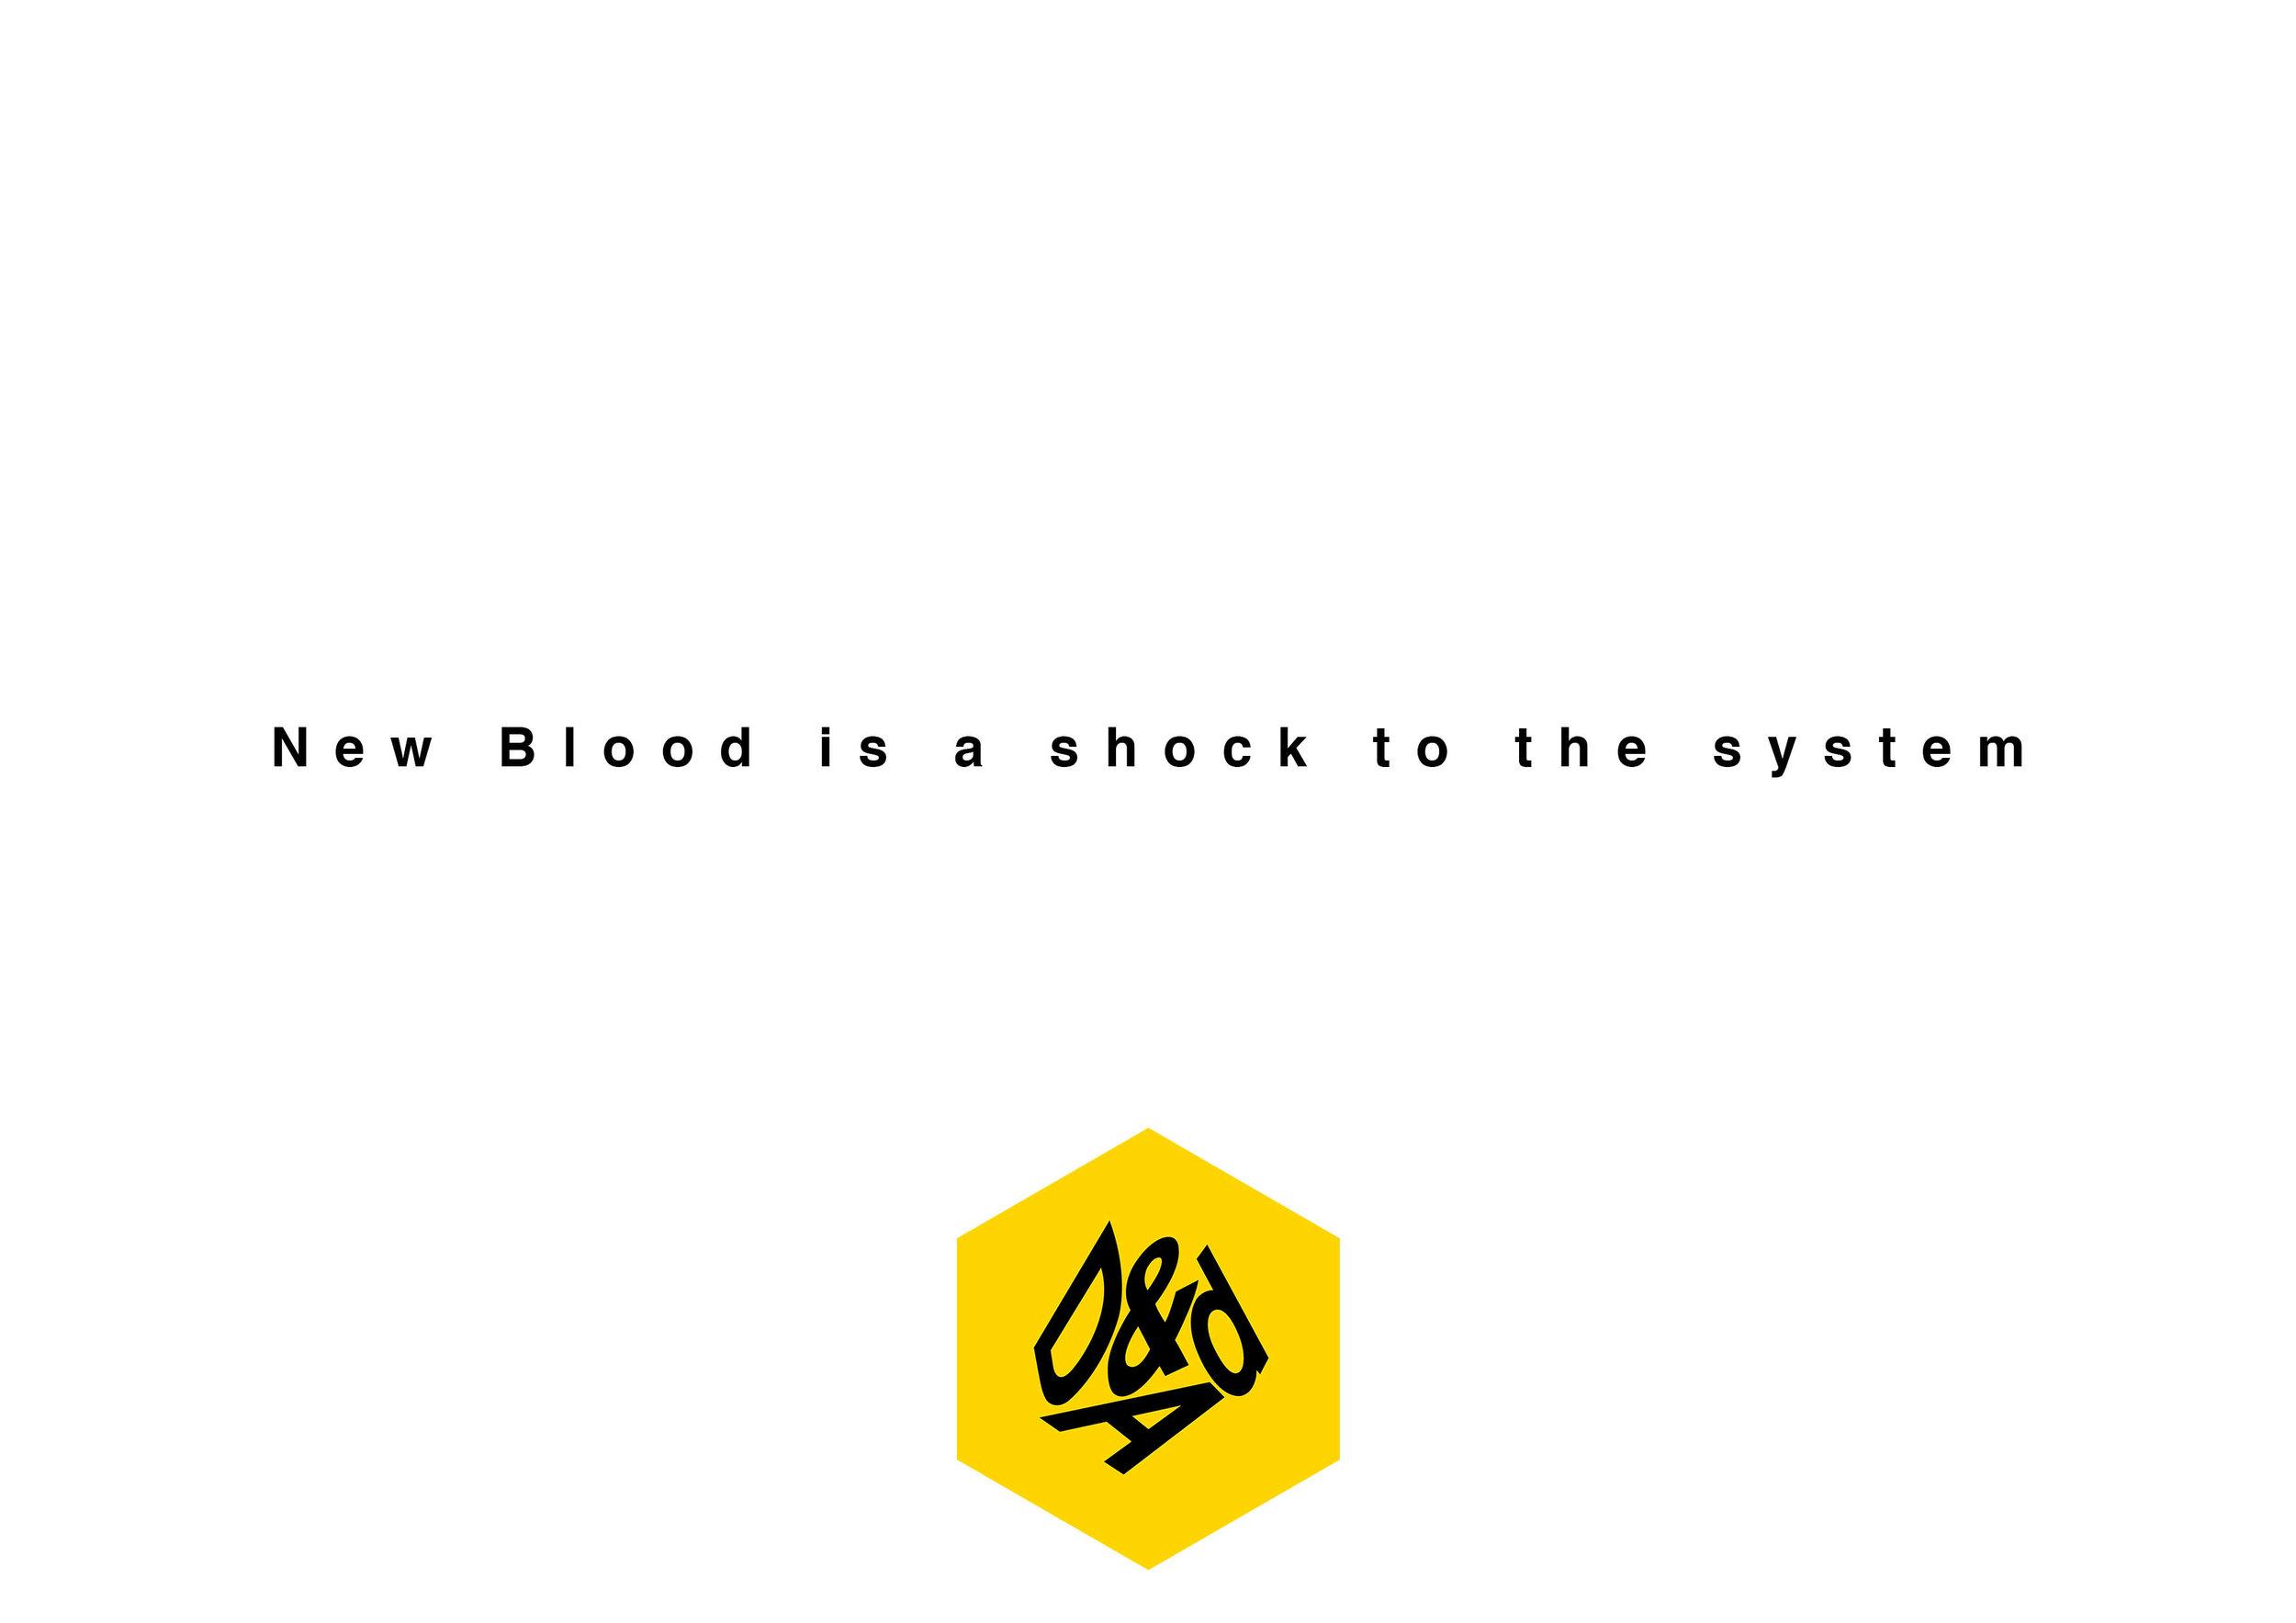 Shock to System-dandad.jpg